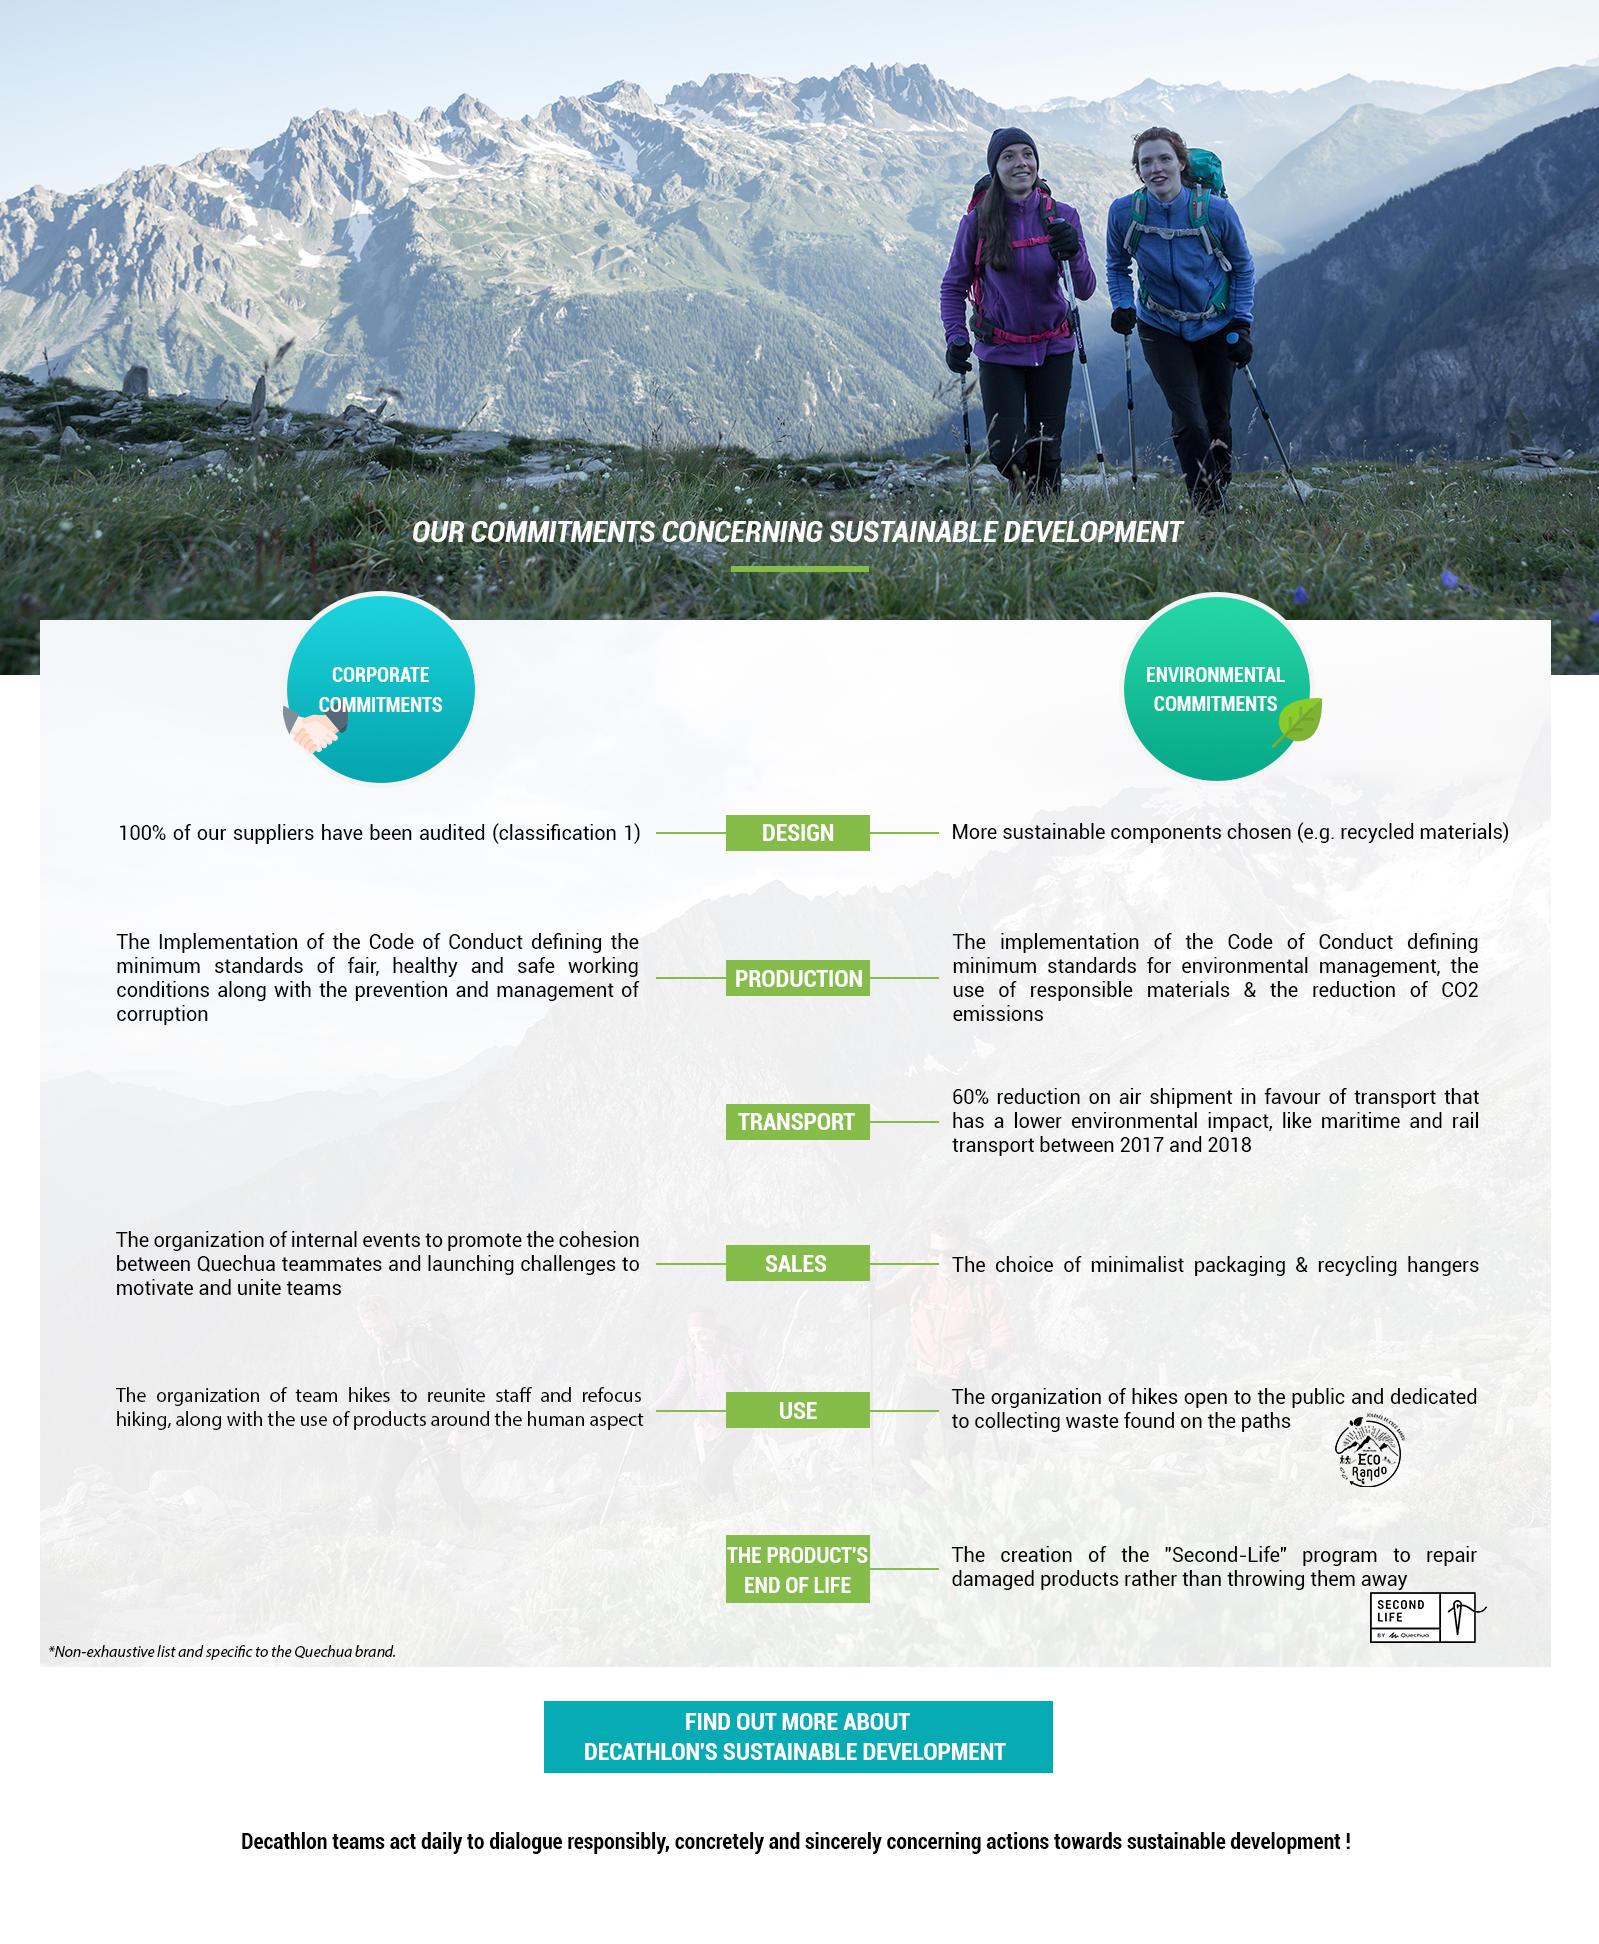 sustainable development Quechua